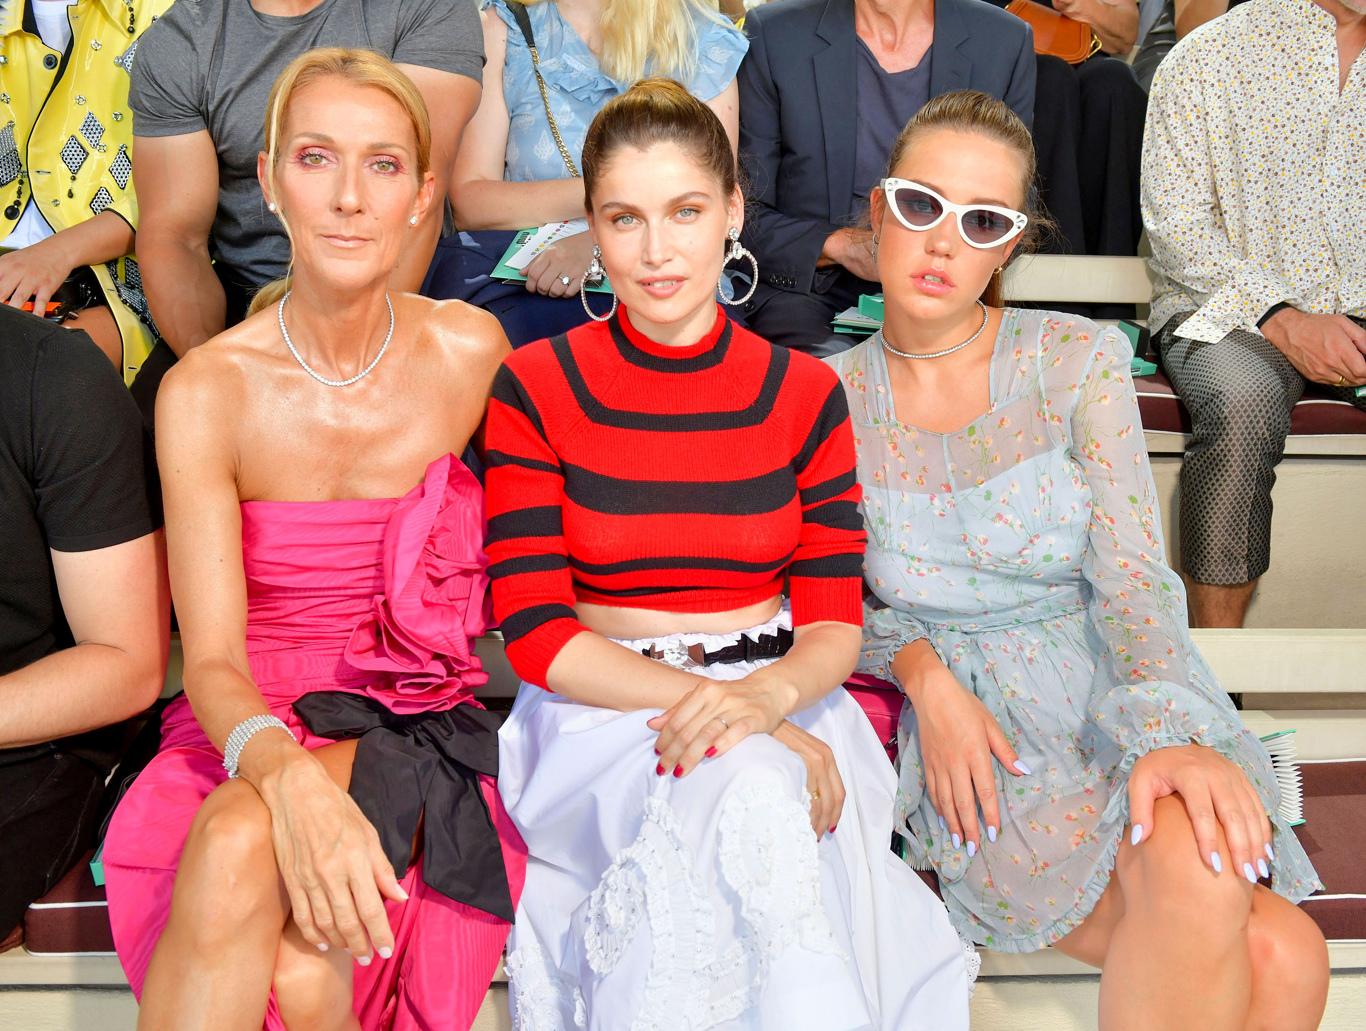 Celine Dion, Laetitia Casta and Adele Exarchopoulos